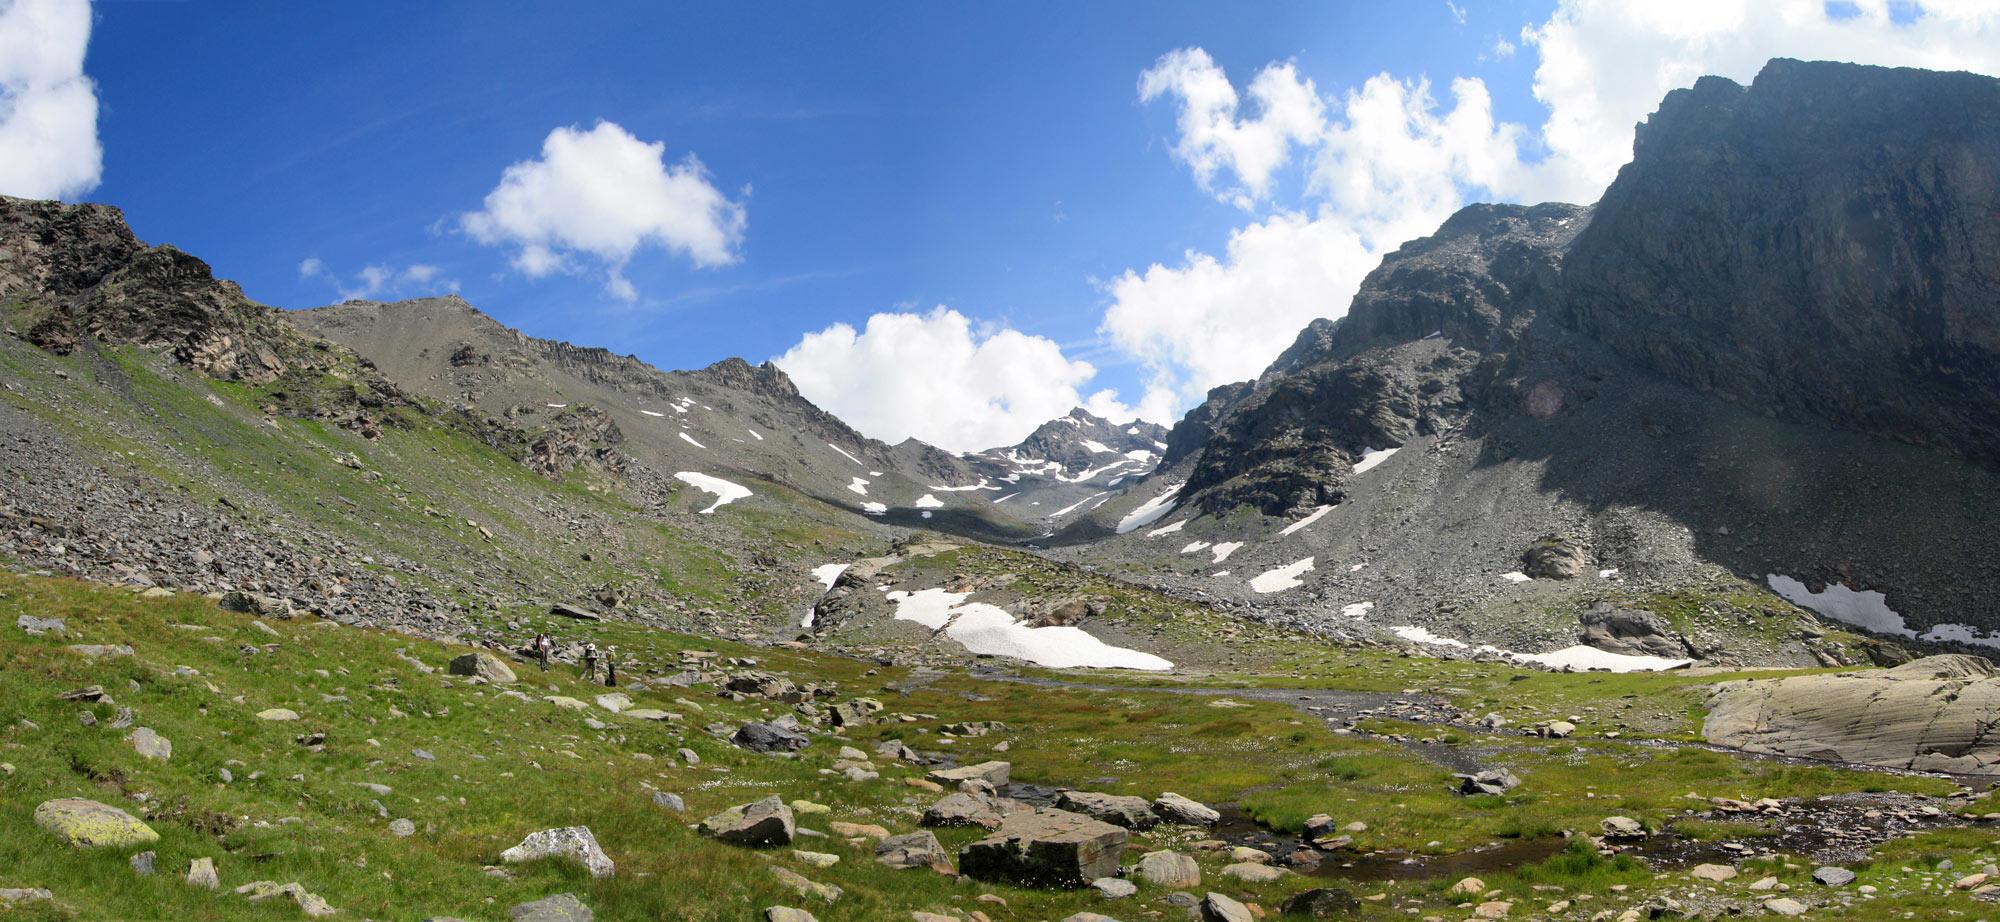 Station de ski Orelle 3 Vallées - Plan Bouchet